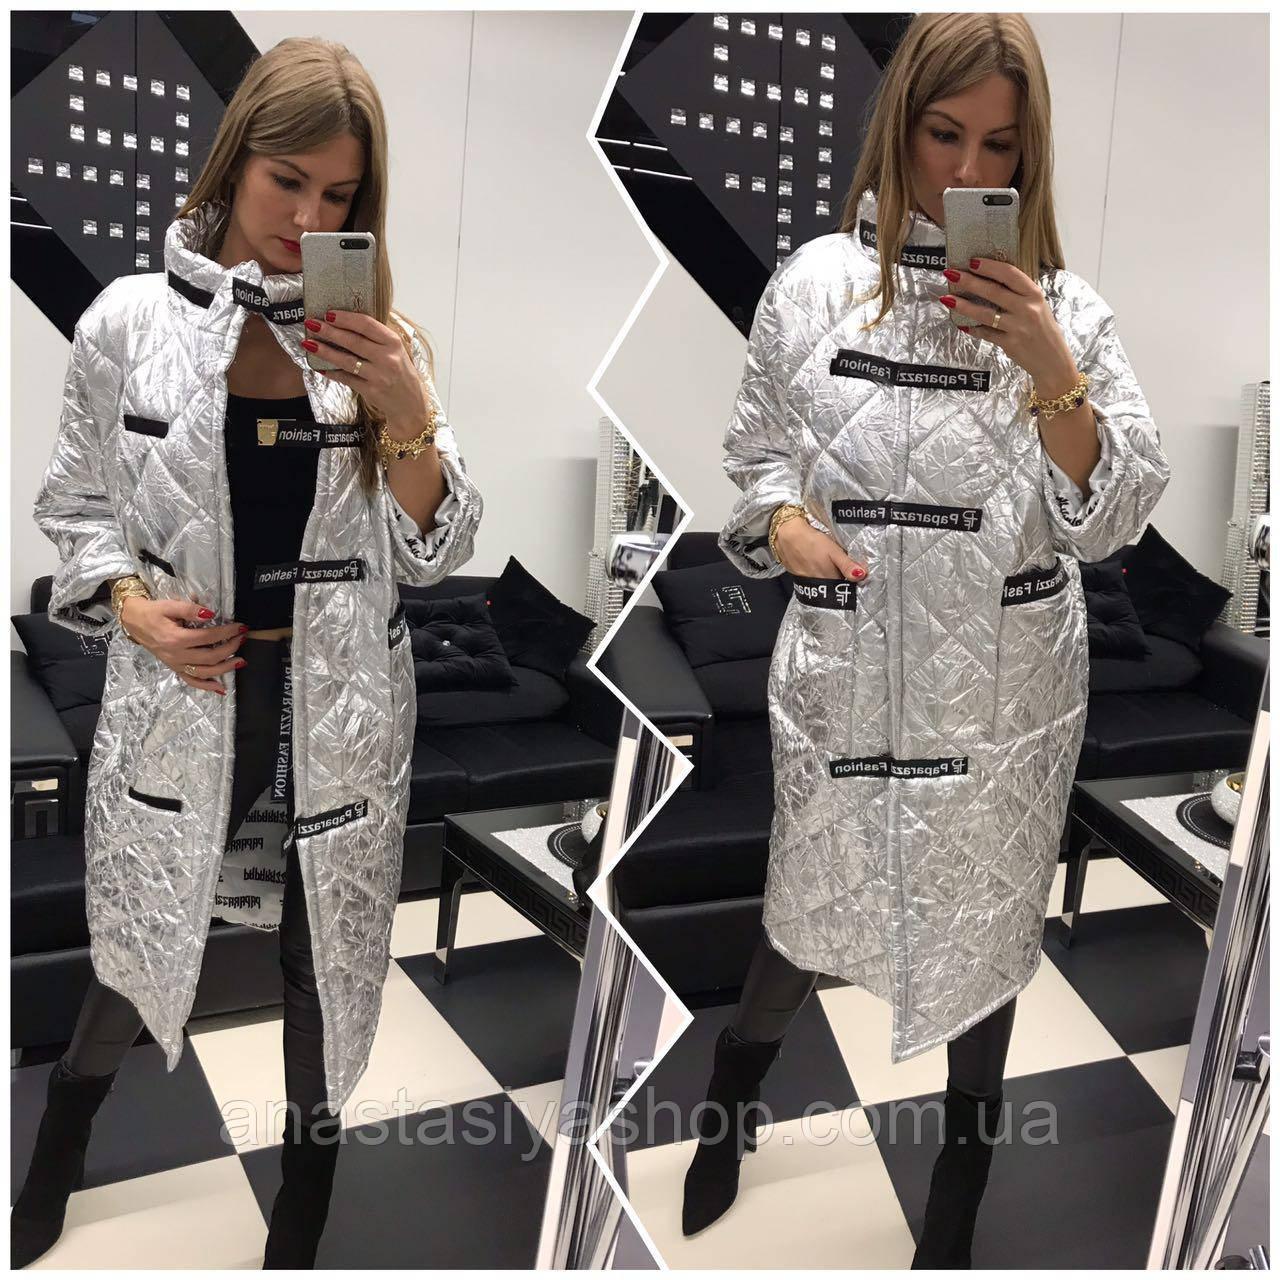 Новинка!! Модная куртка цвета серебро.